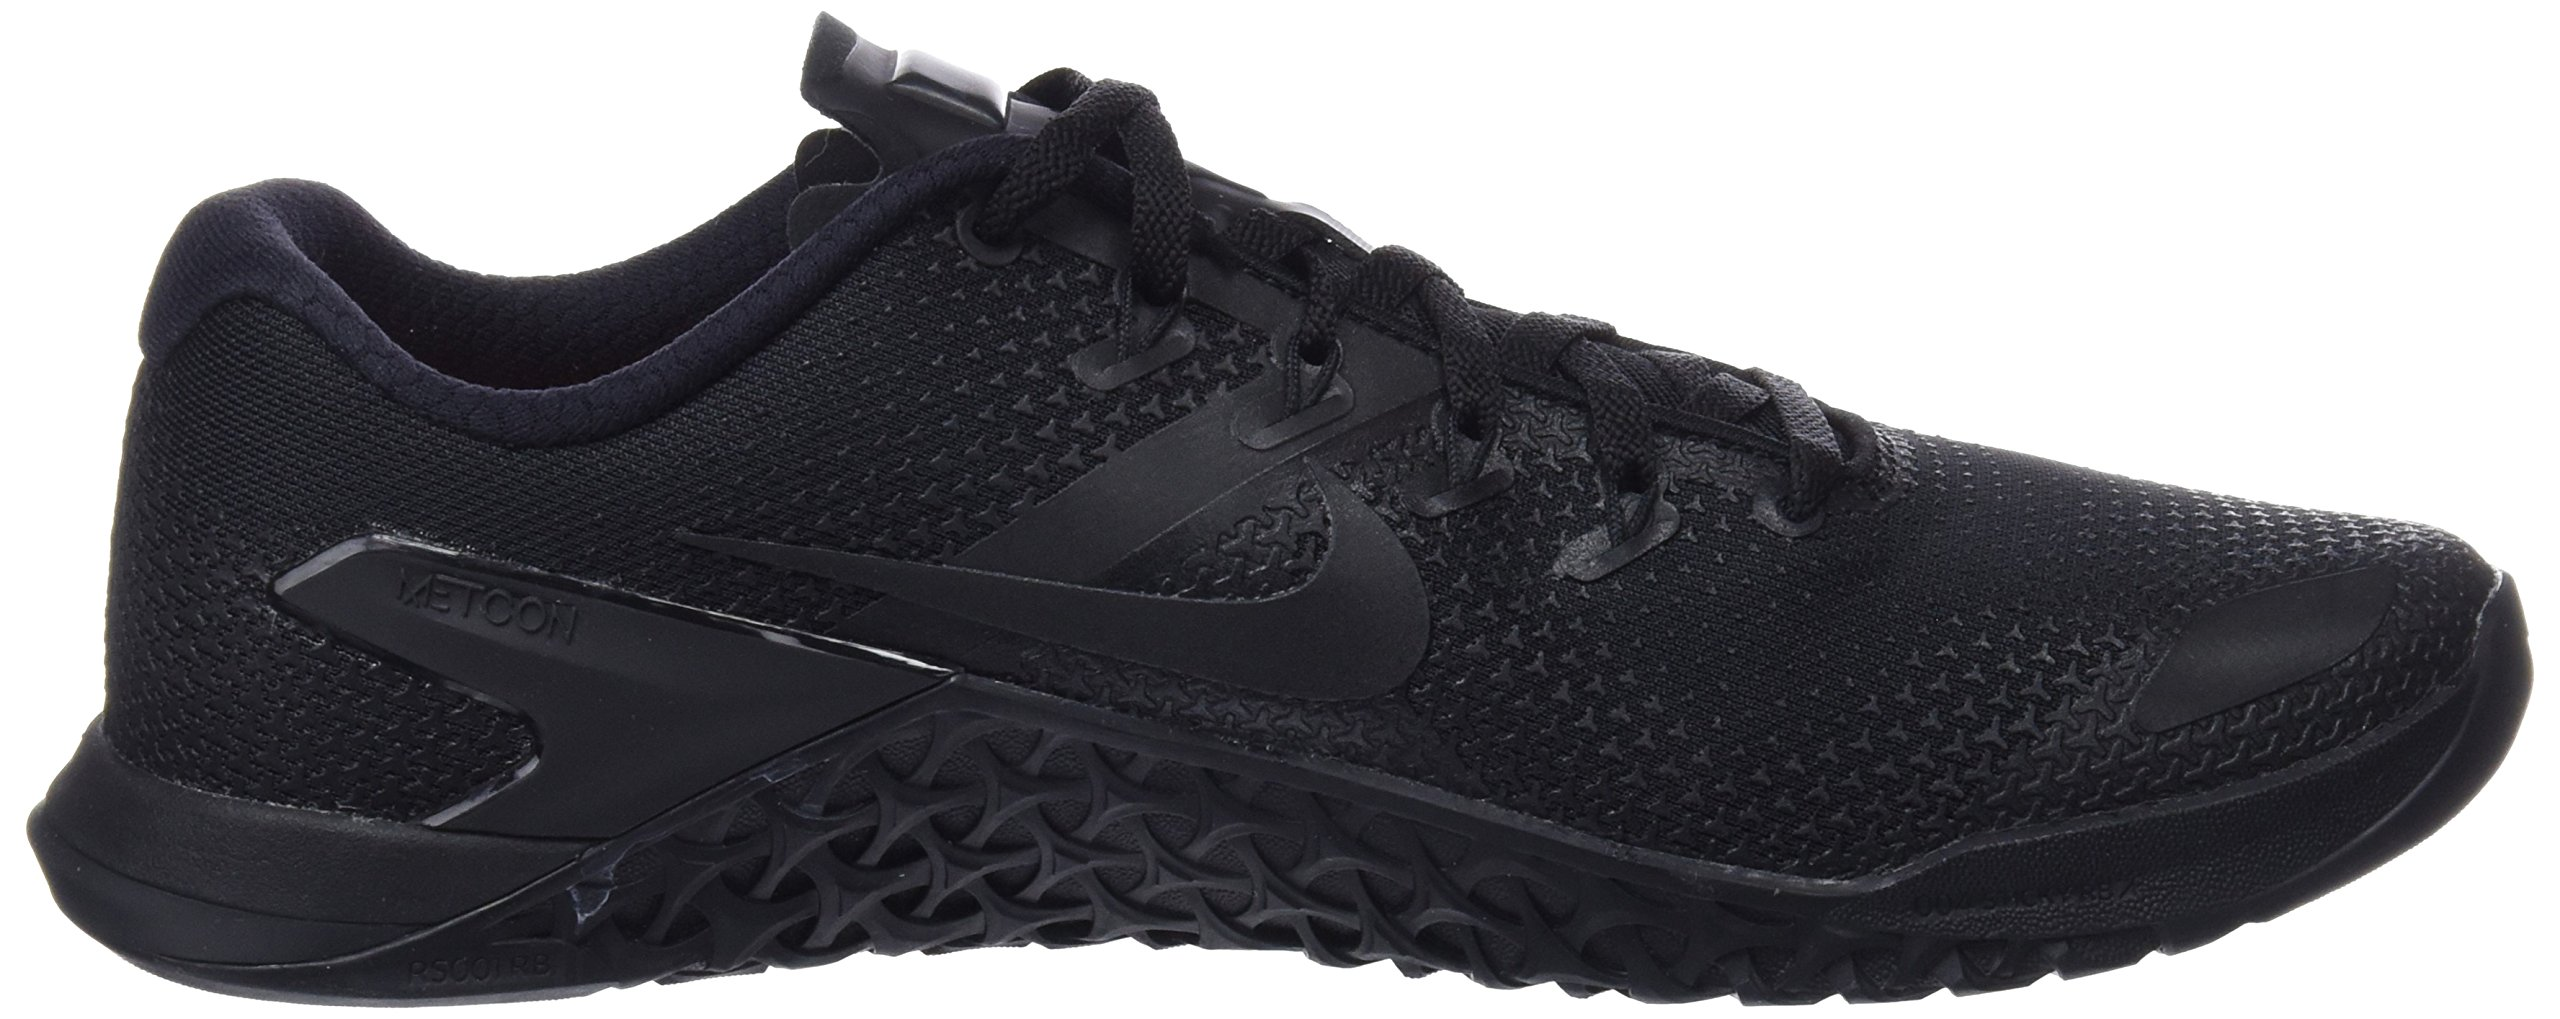 Nike Men's Metcon 4 Training Shoe Black/Black-Black-Hyper Crimson 7.5 by Nike (Image #6)